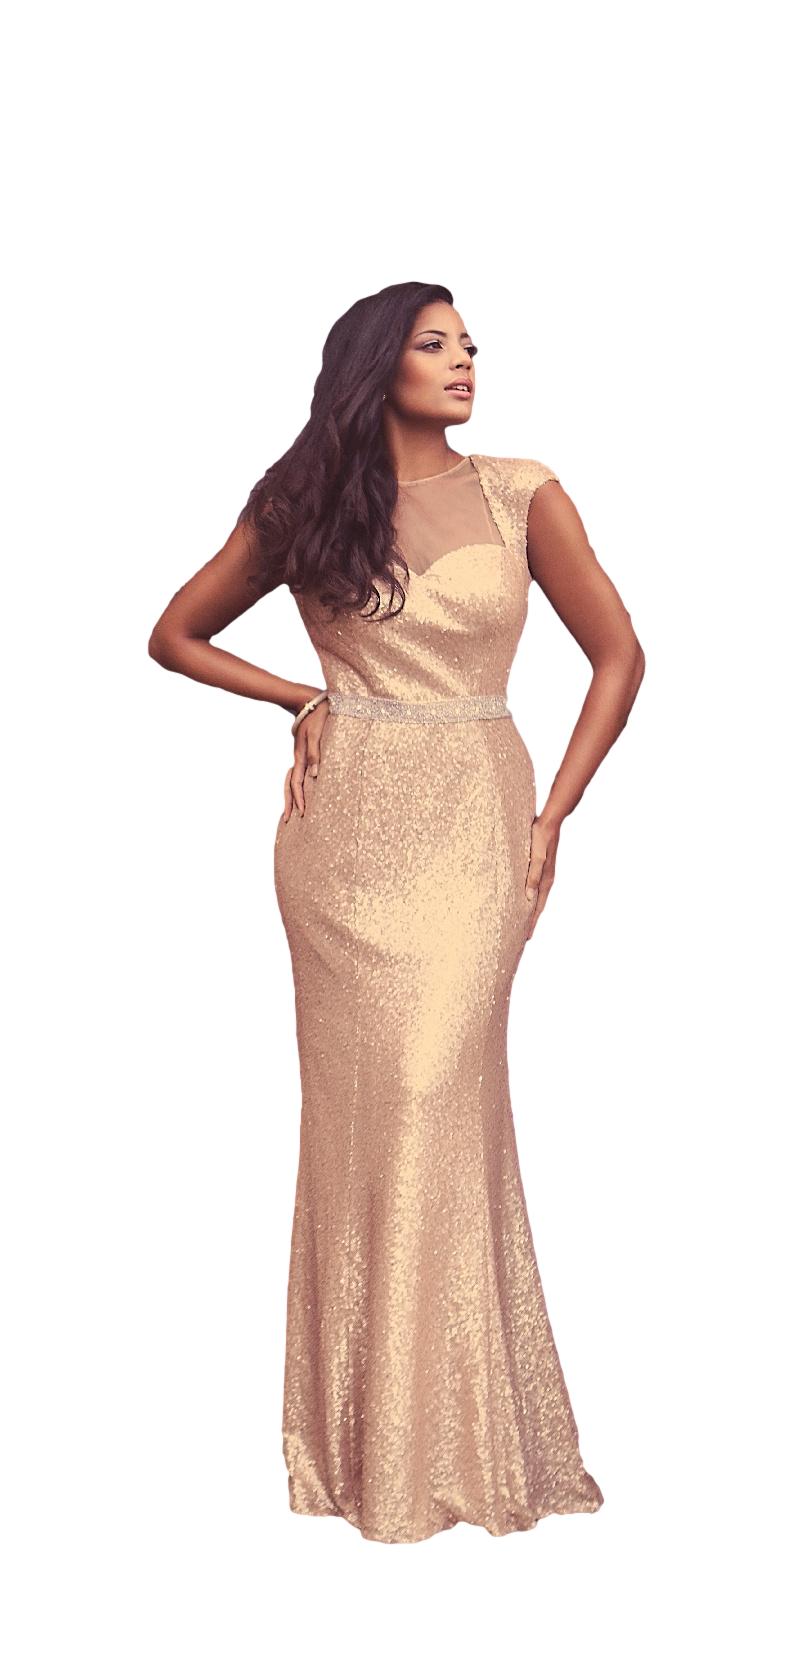 Estilo Moda Bridal Eve Gold Sequin Wedding Dress, Prom Dress, Bridesmaids Dress 2015 Wedding Trends